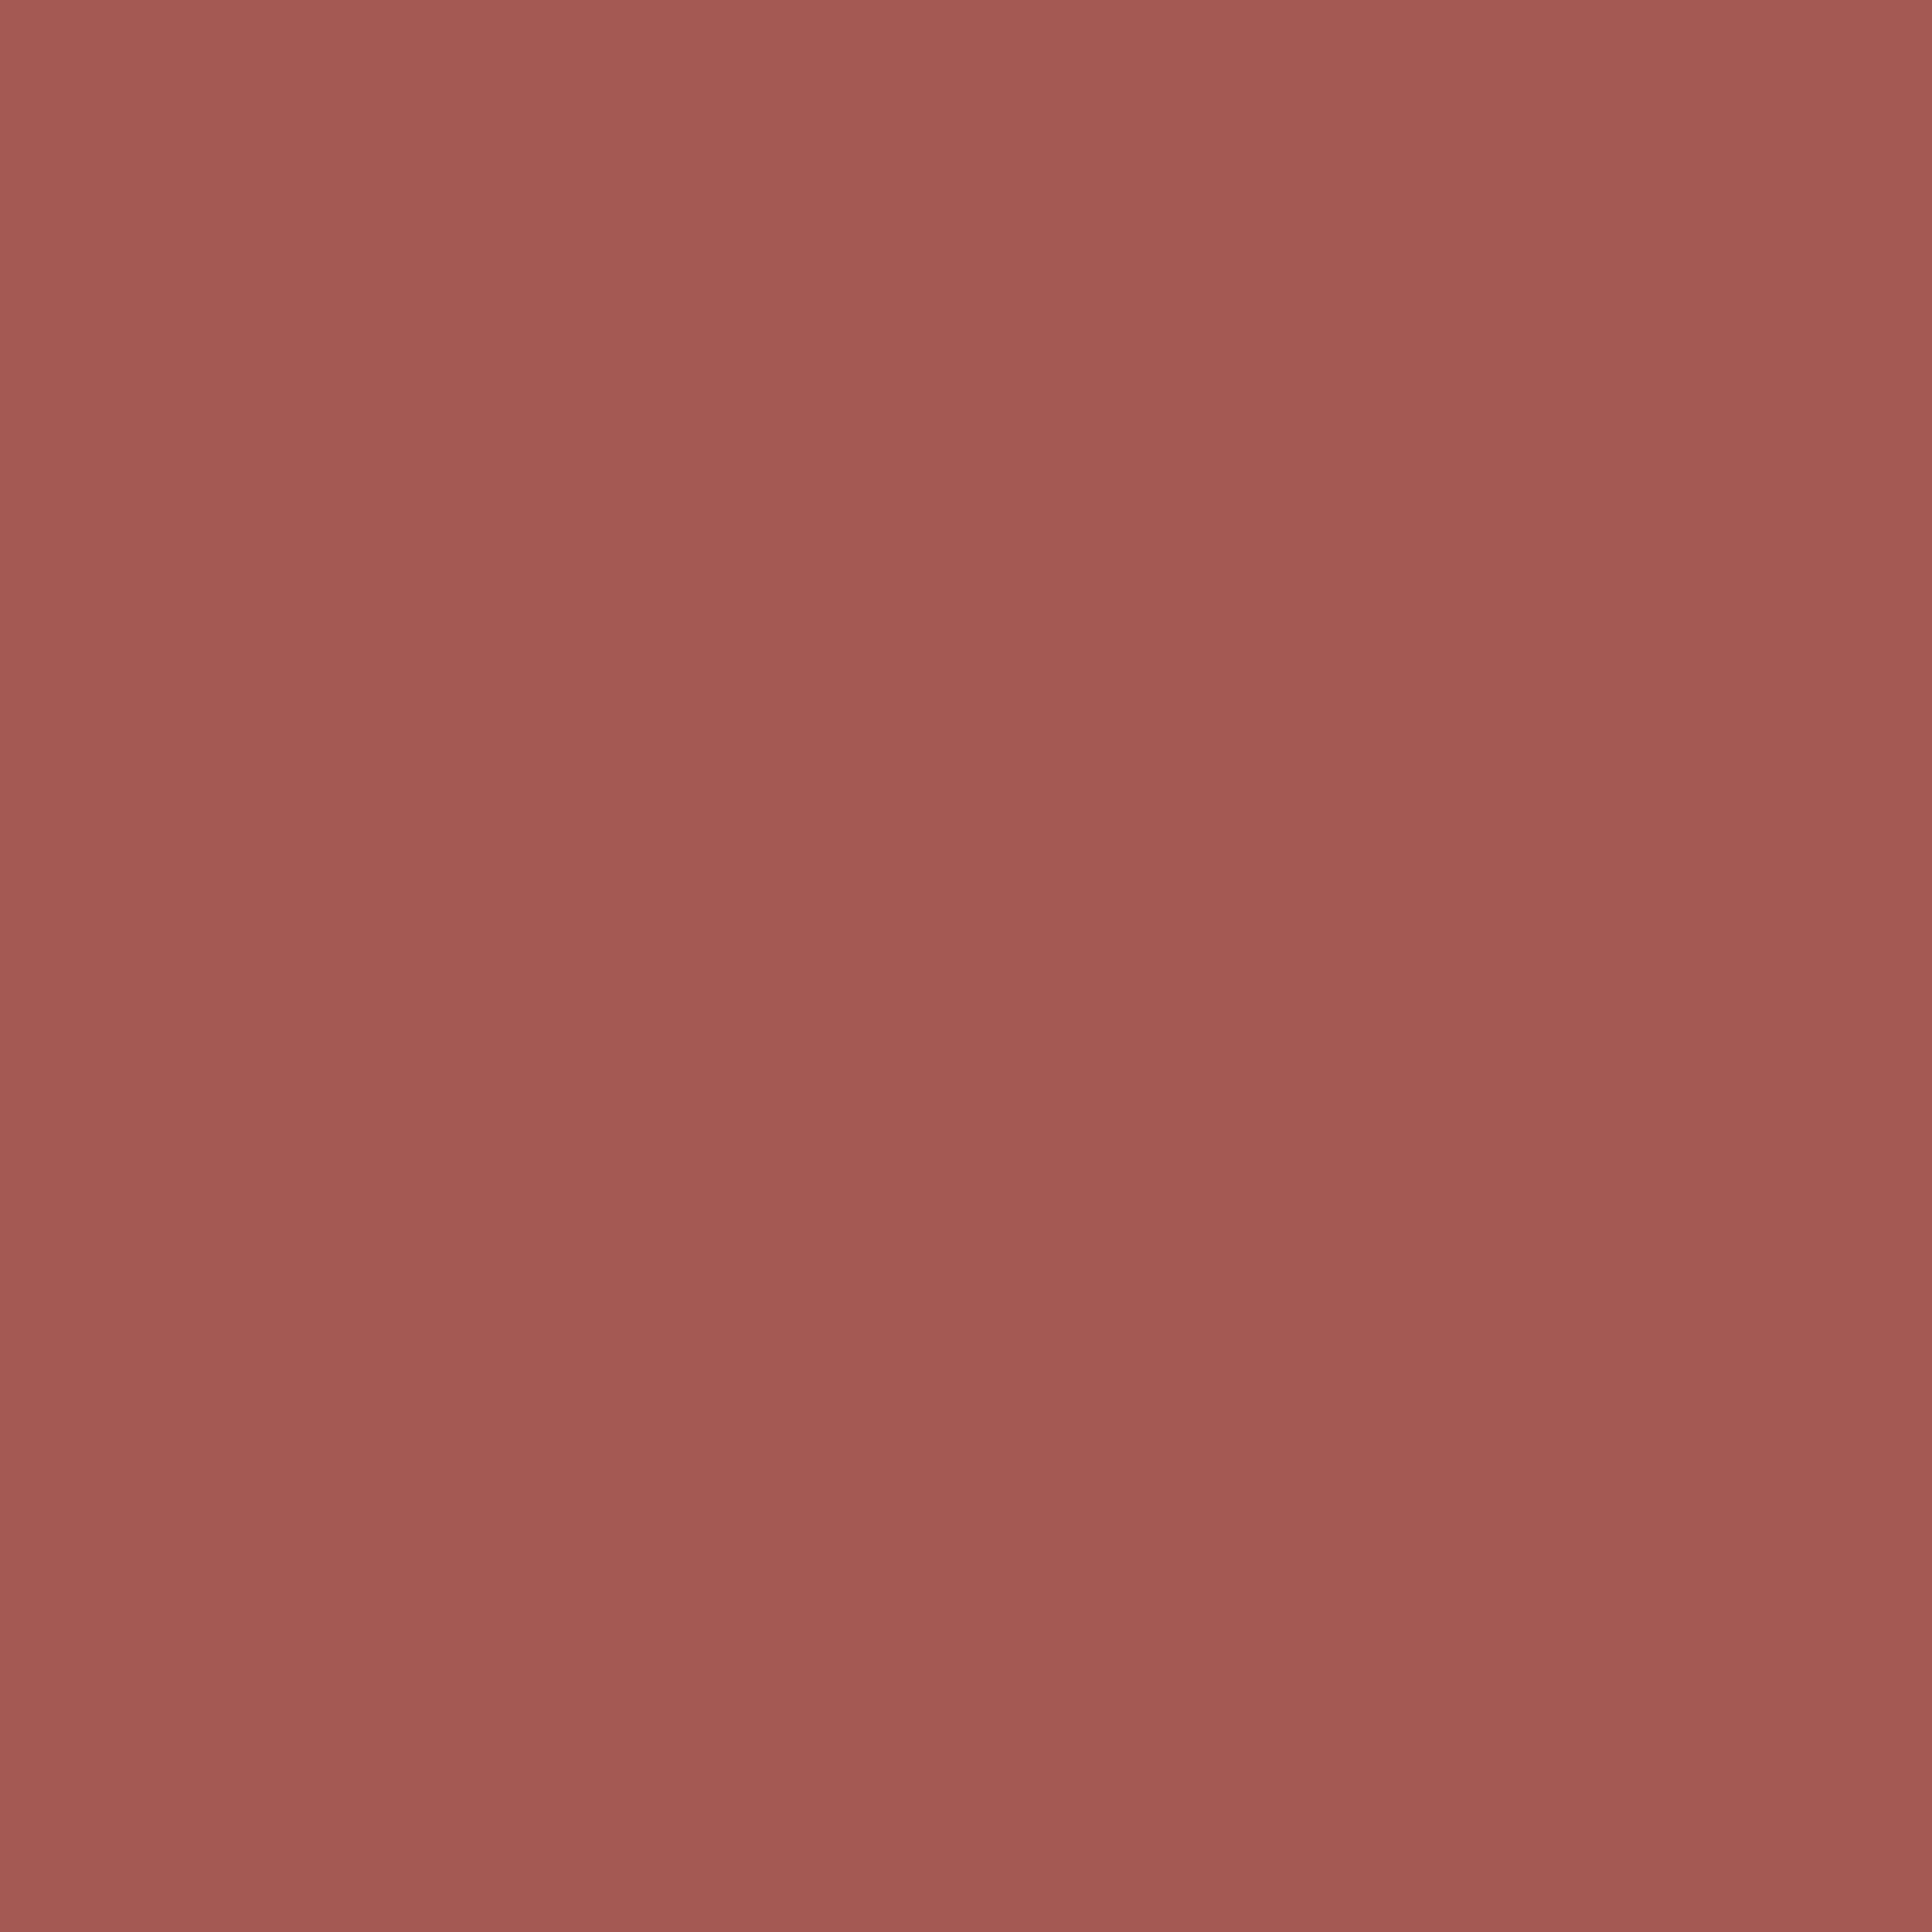 2732x2732 Redwood Solid Color Background